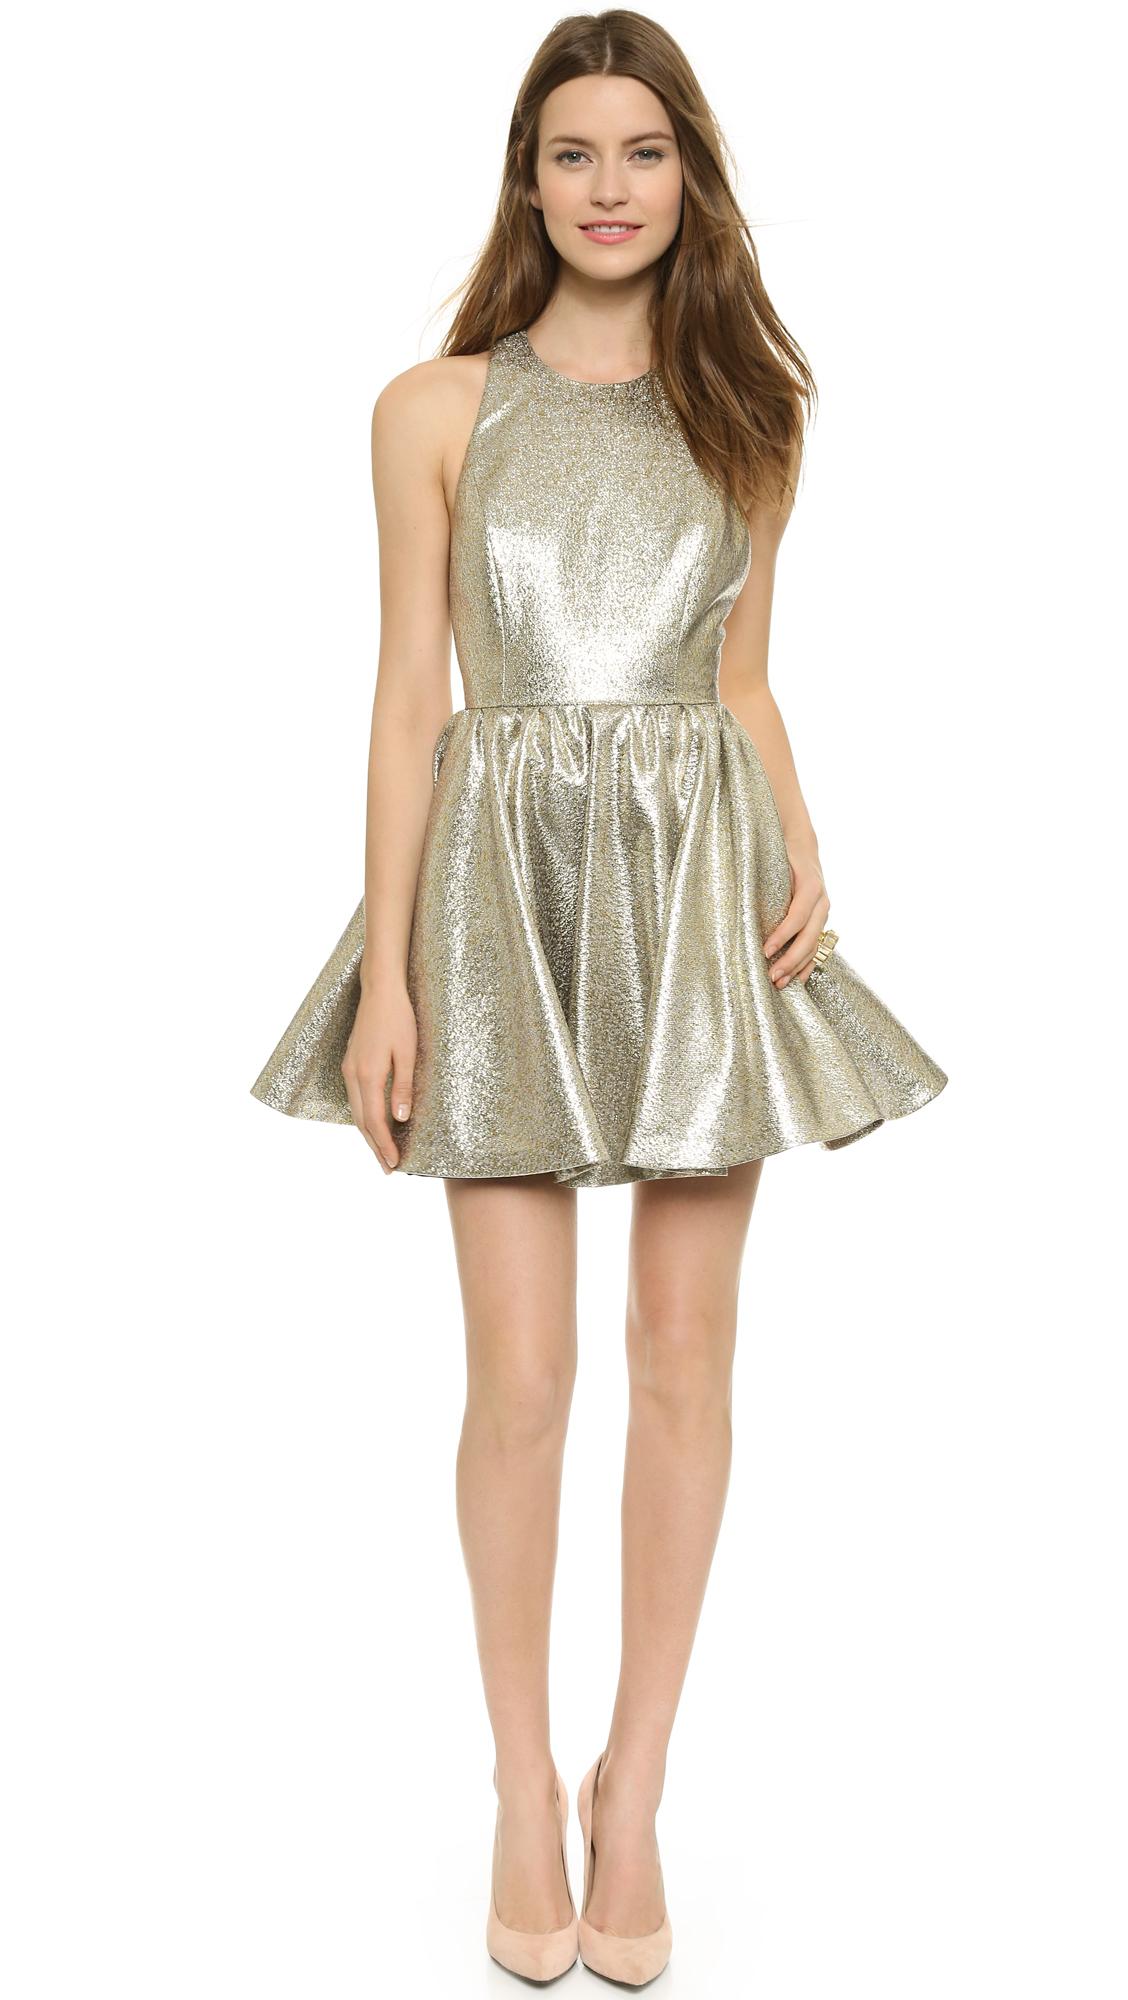 Metallic Party Dresses_Party Dresses_dressesss